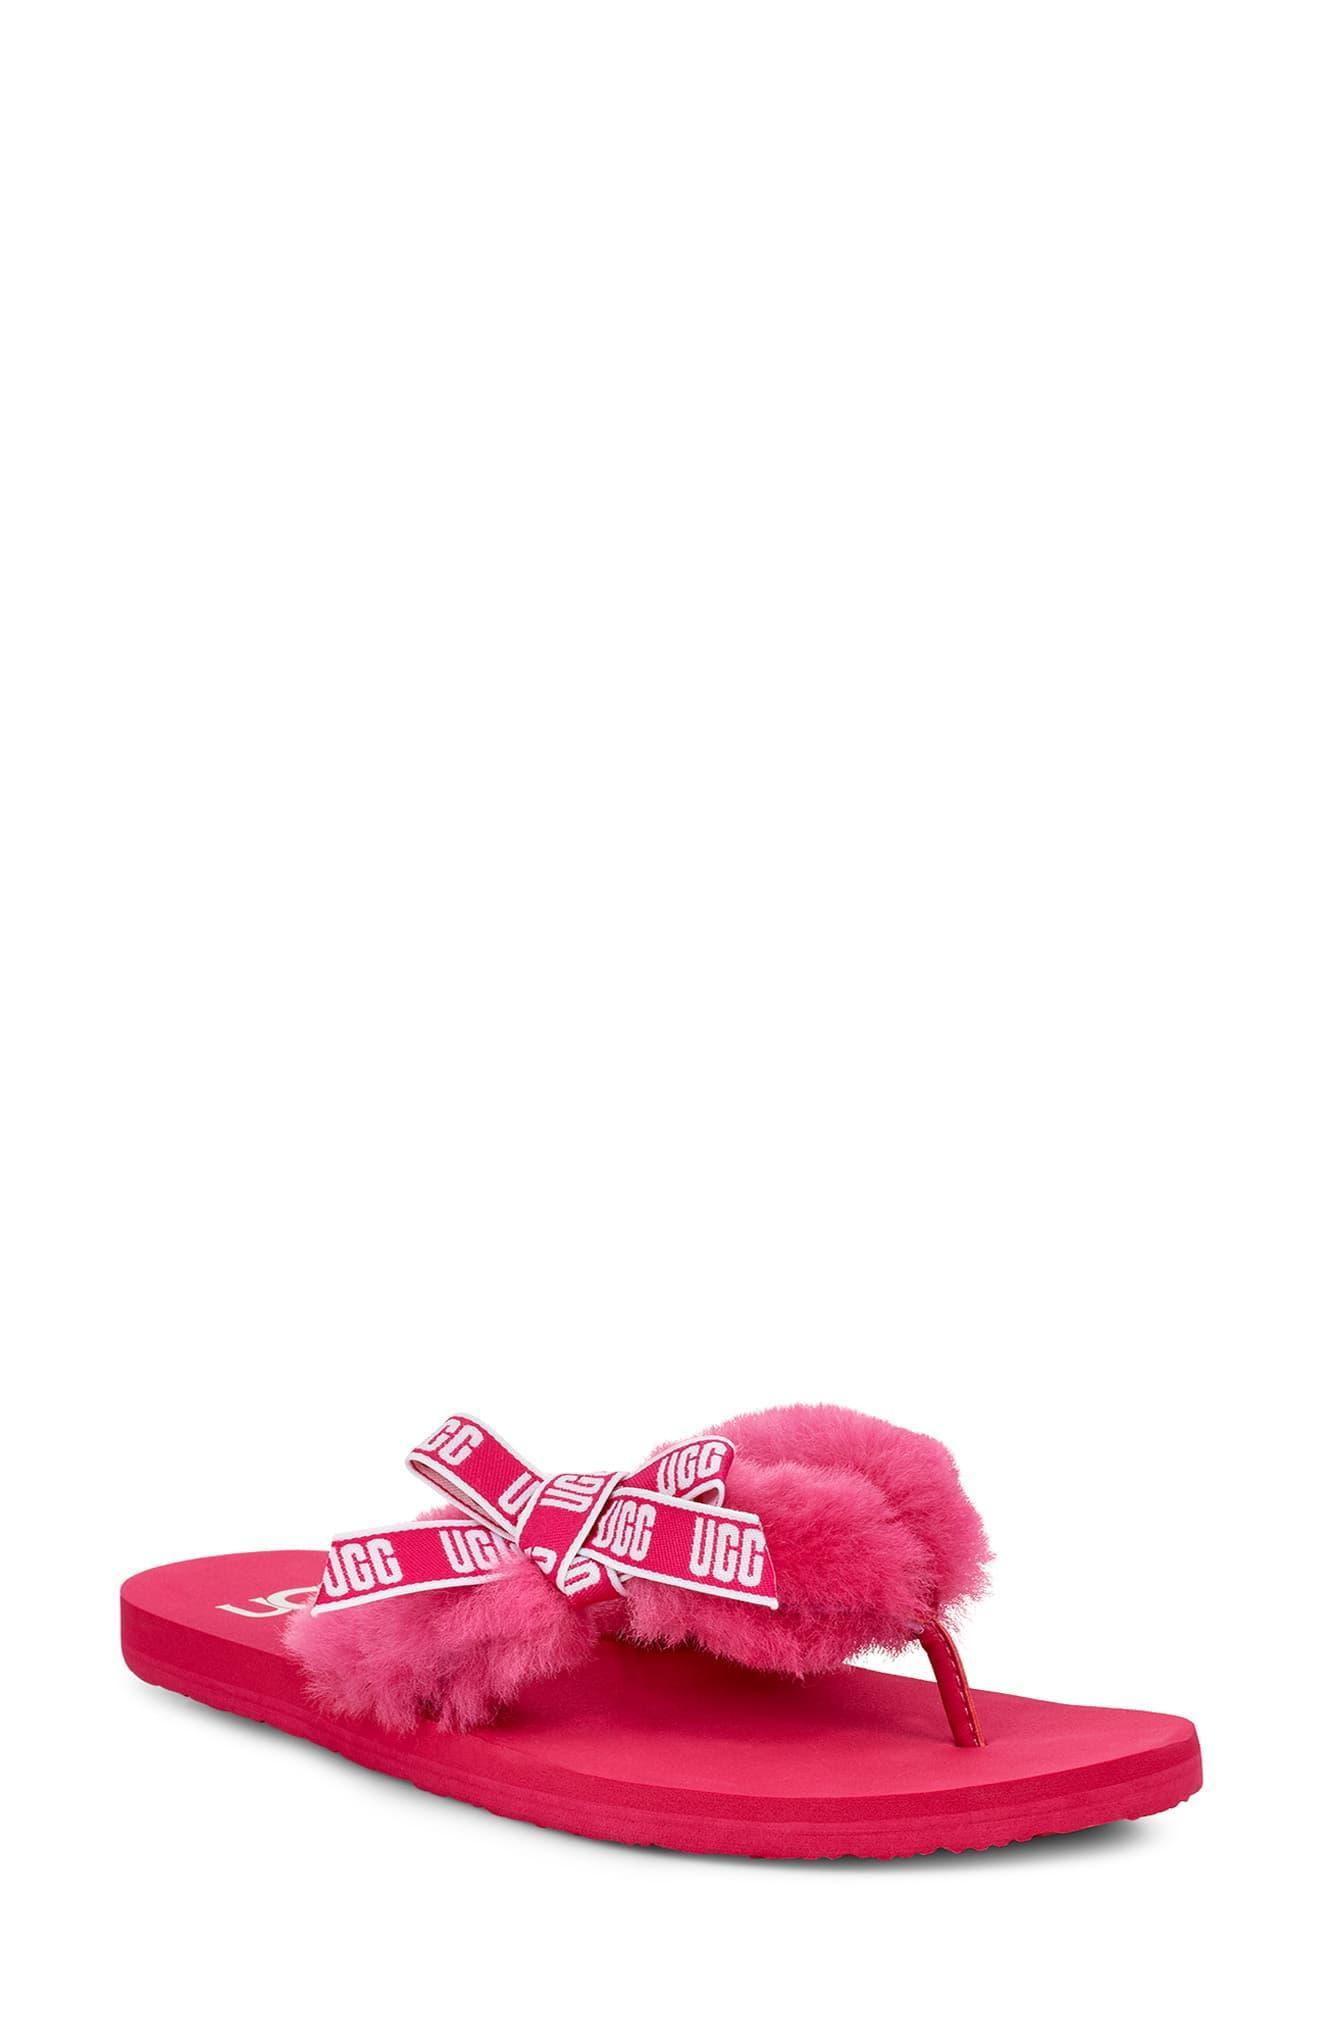 425cc172f9e Ugg Pink Ugg Sunset Graphic Genuine Shearling Flip Flop